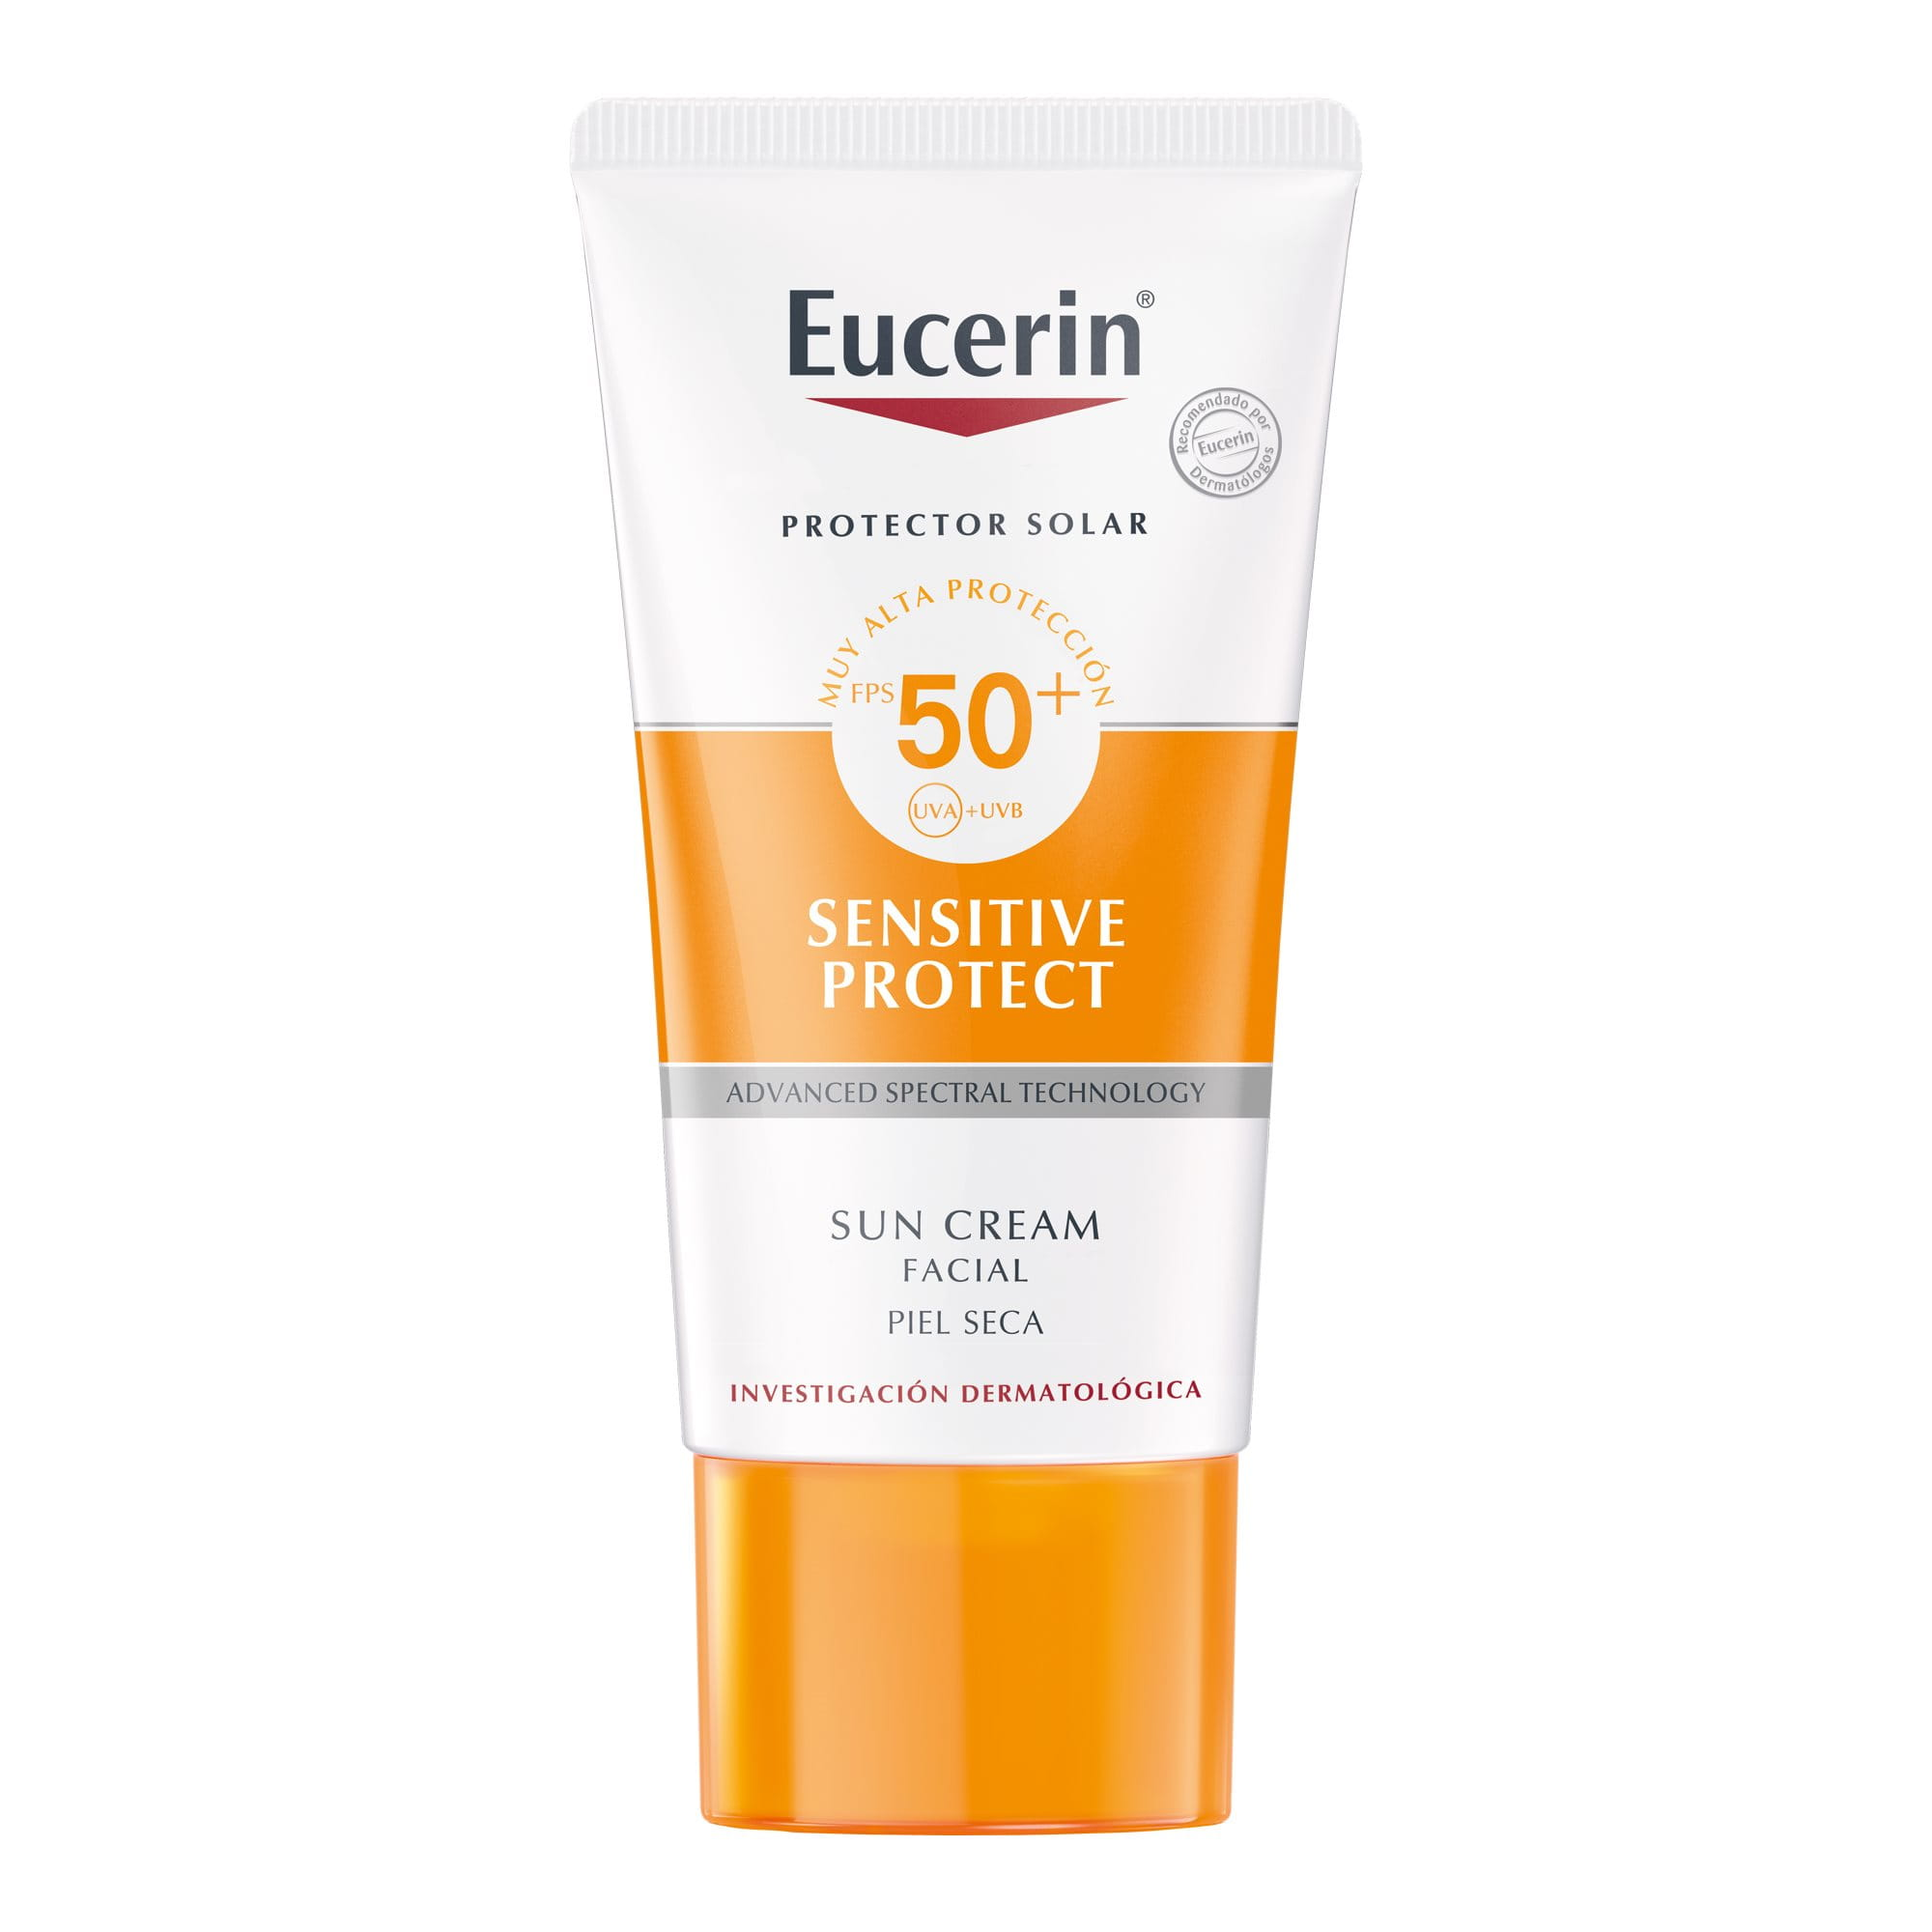 63842-EUCERIN-SUN-FACE-CREME-SENSITIVE-PROTECT-FPS50-50ML_packshot